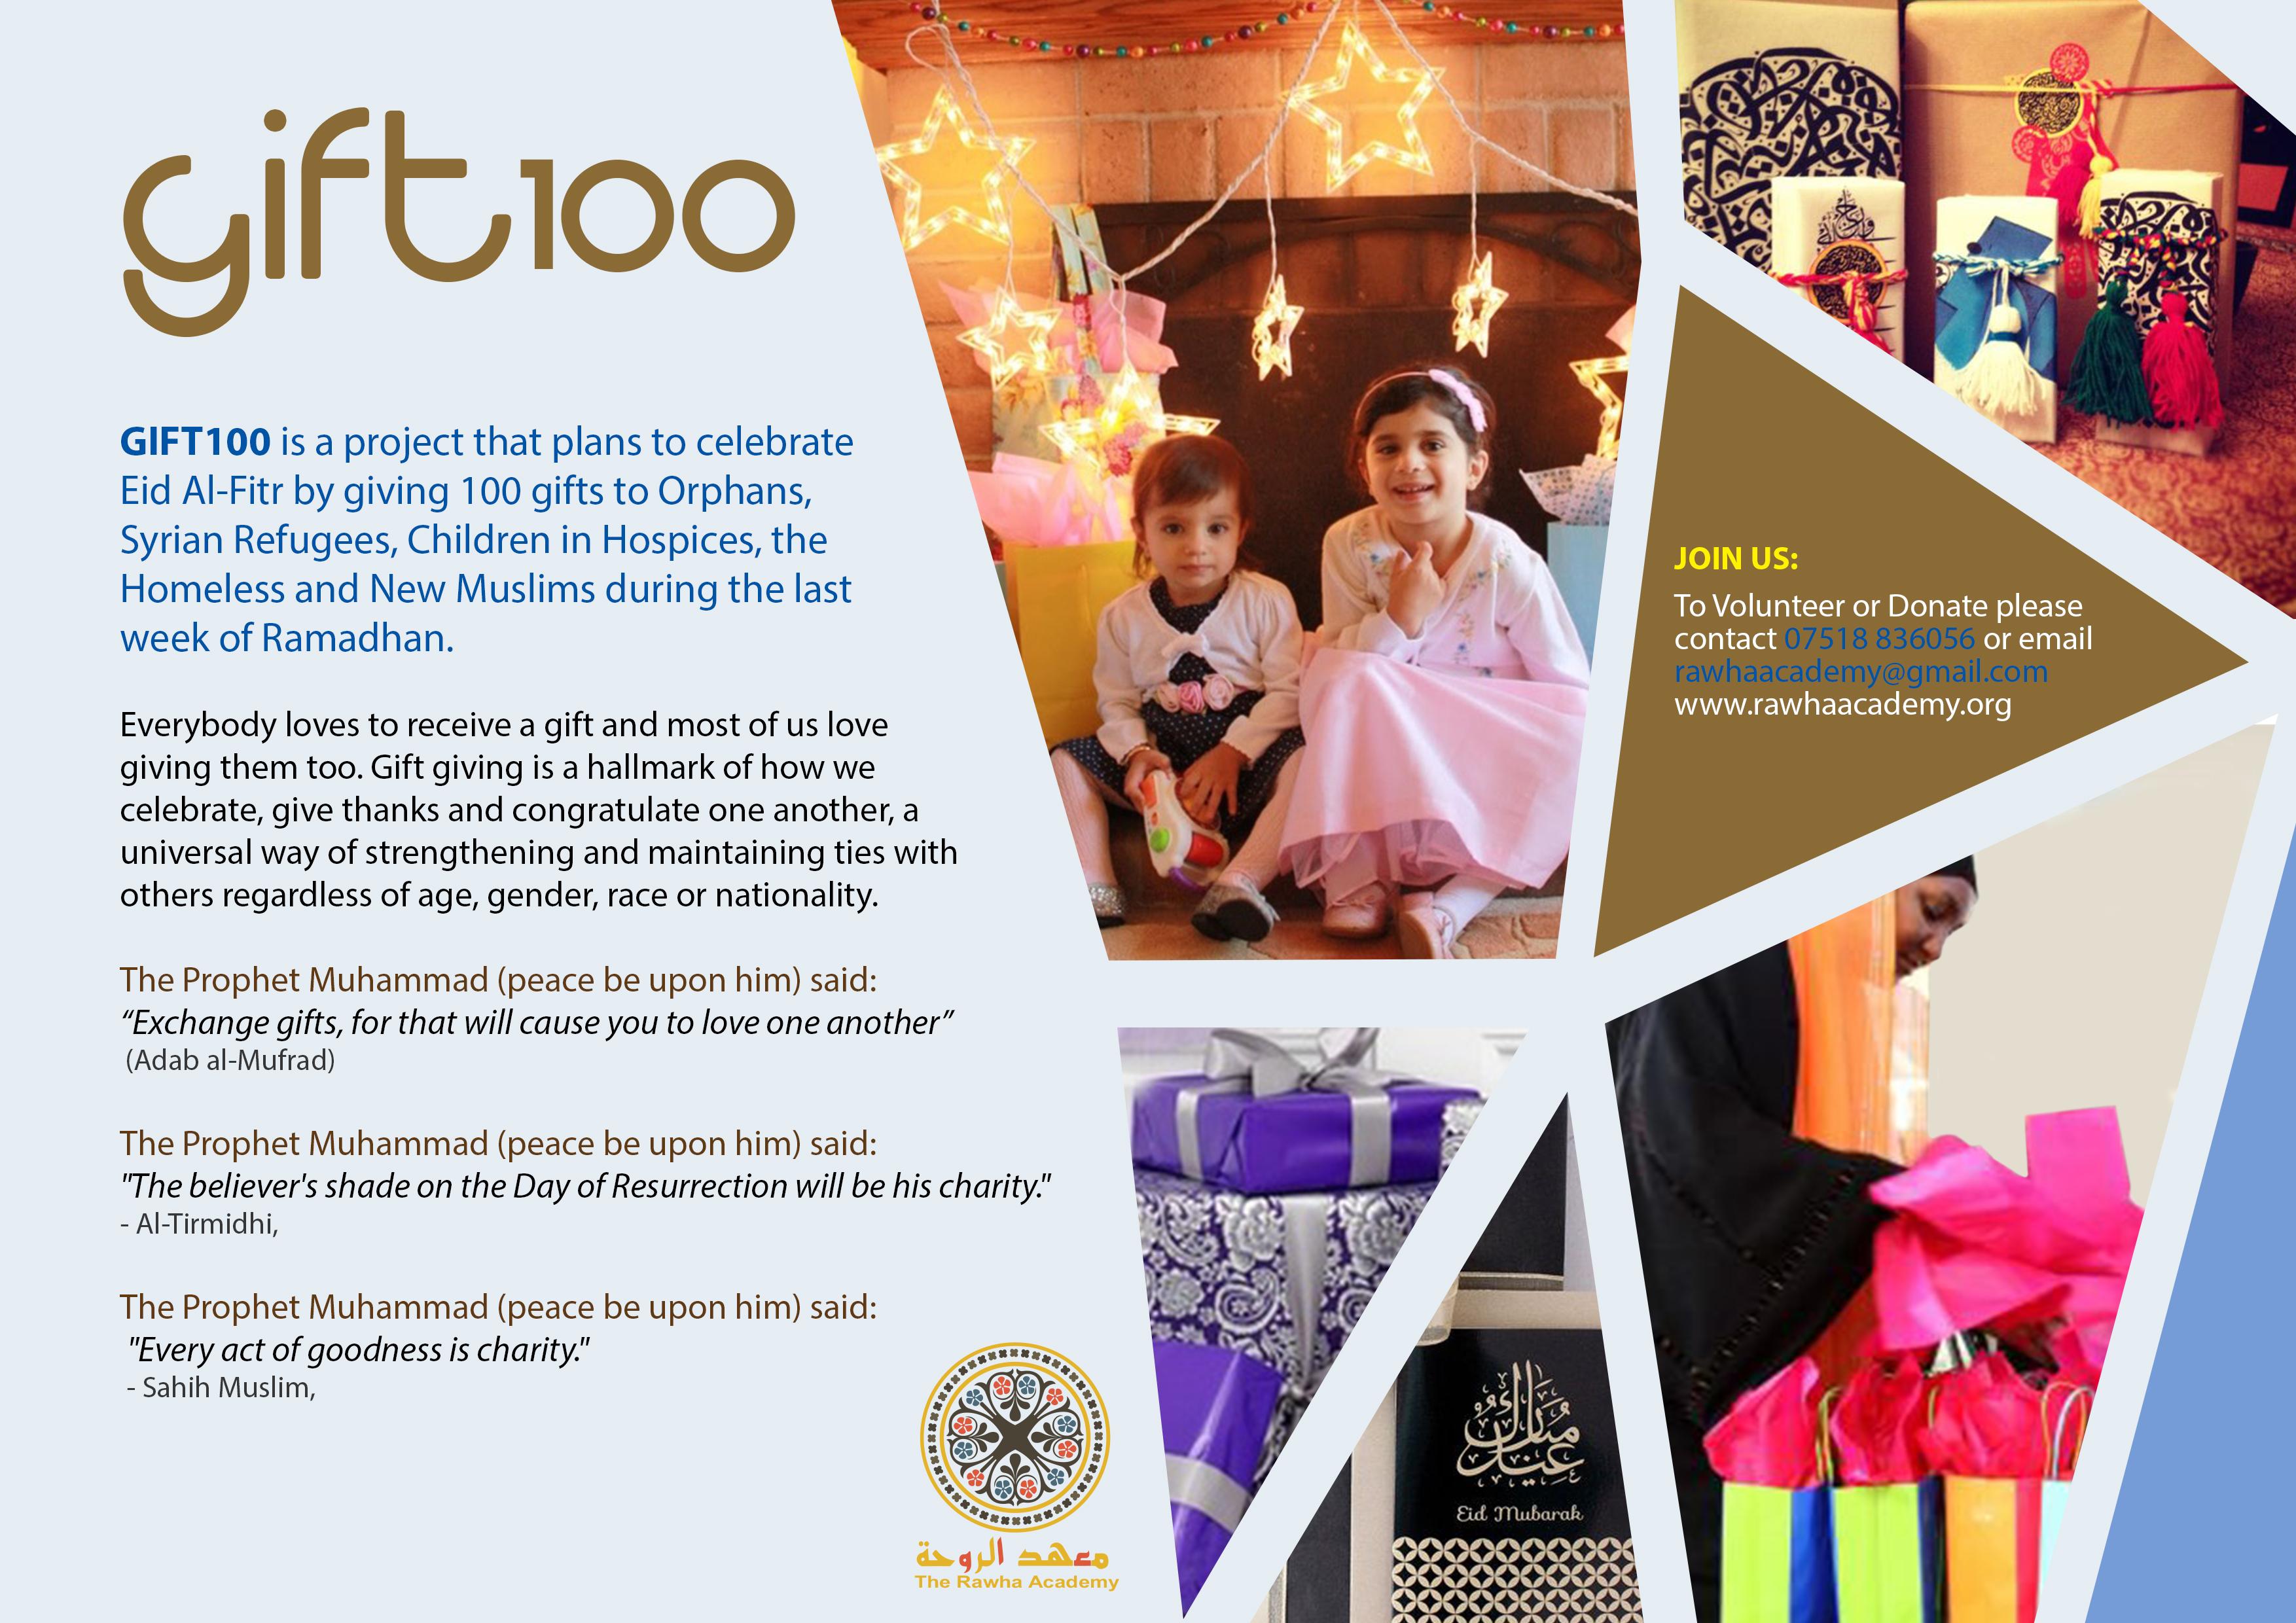 Gift 100 - Rawha Academy